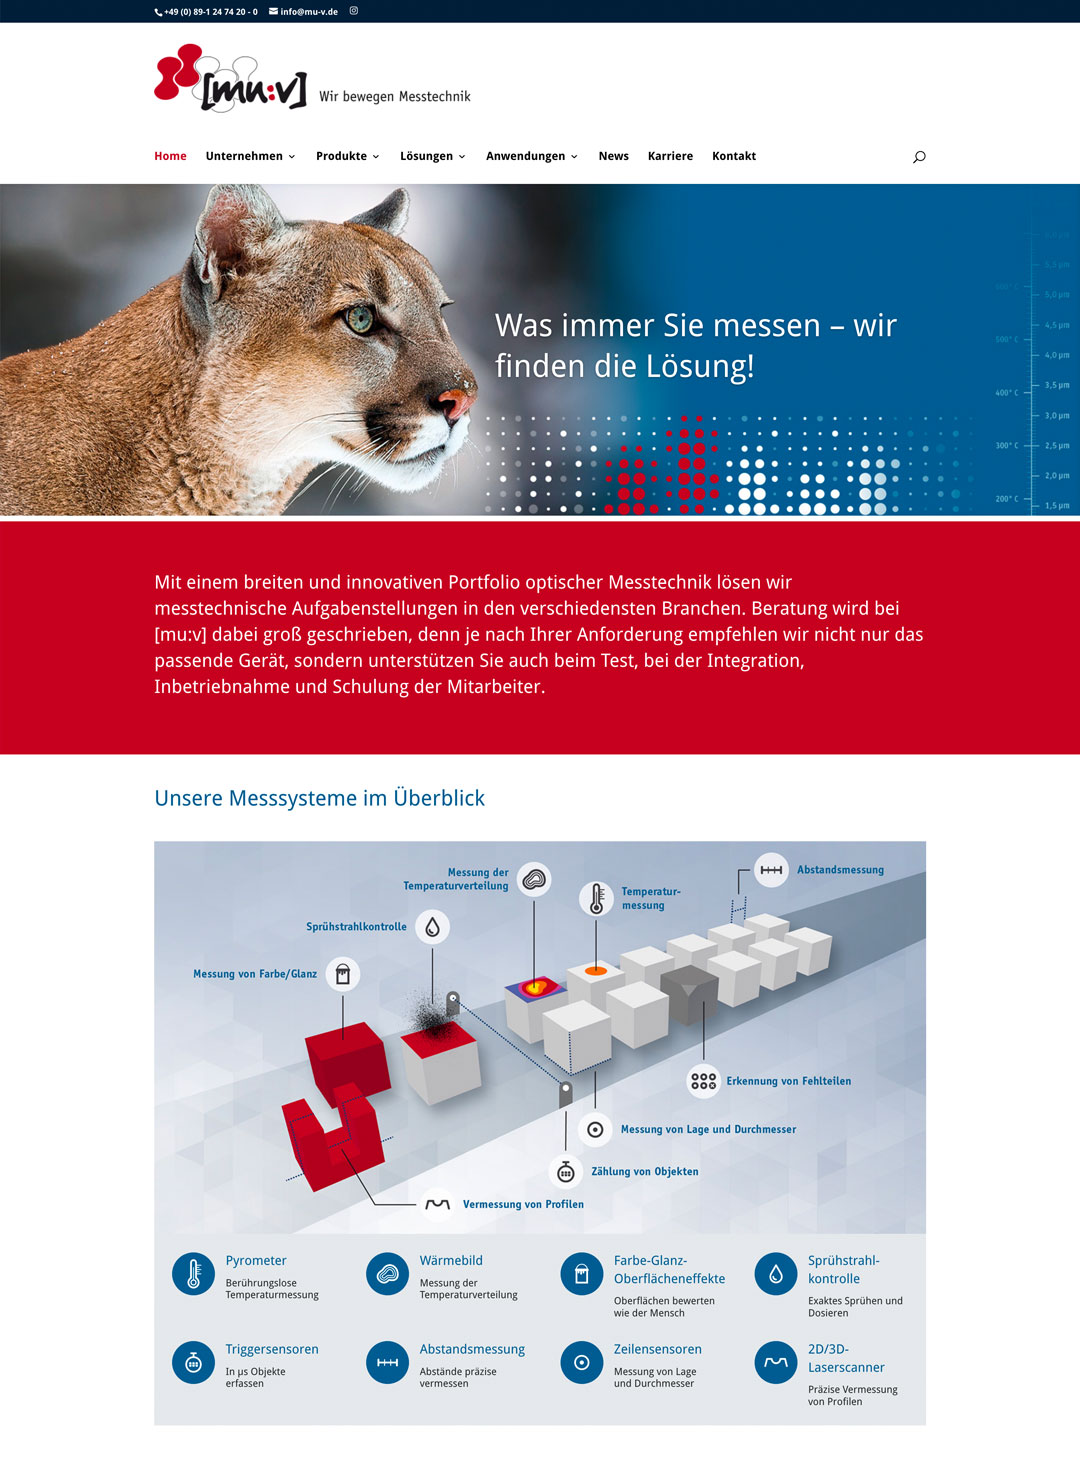 [mu:v] Messtechnik: Corporate Website